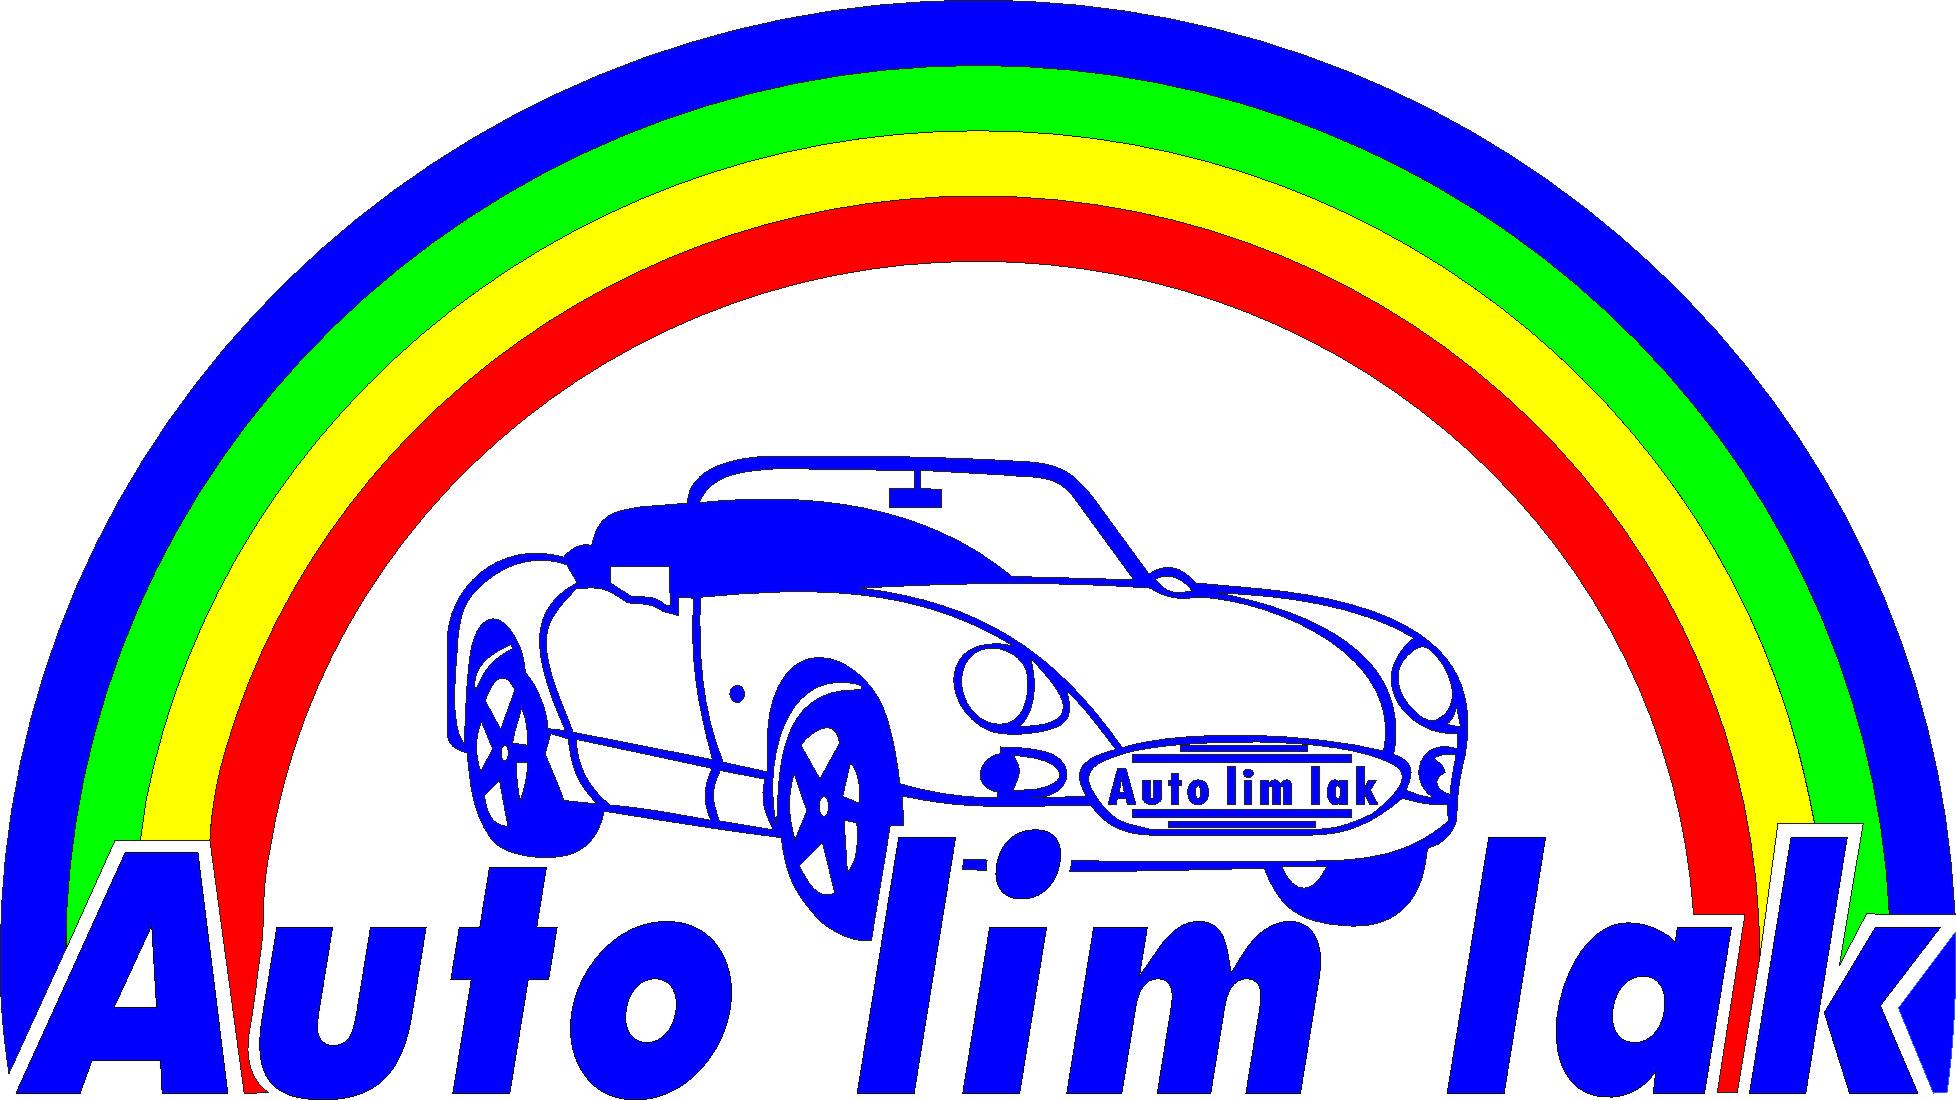 Auto Lim-Lak